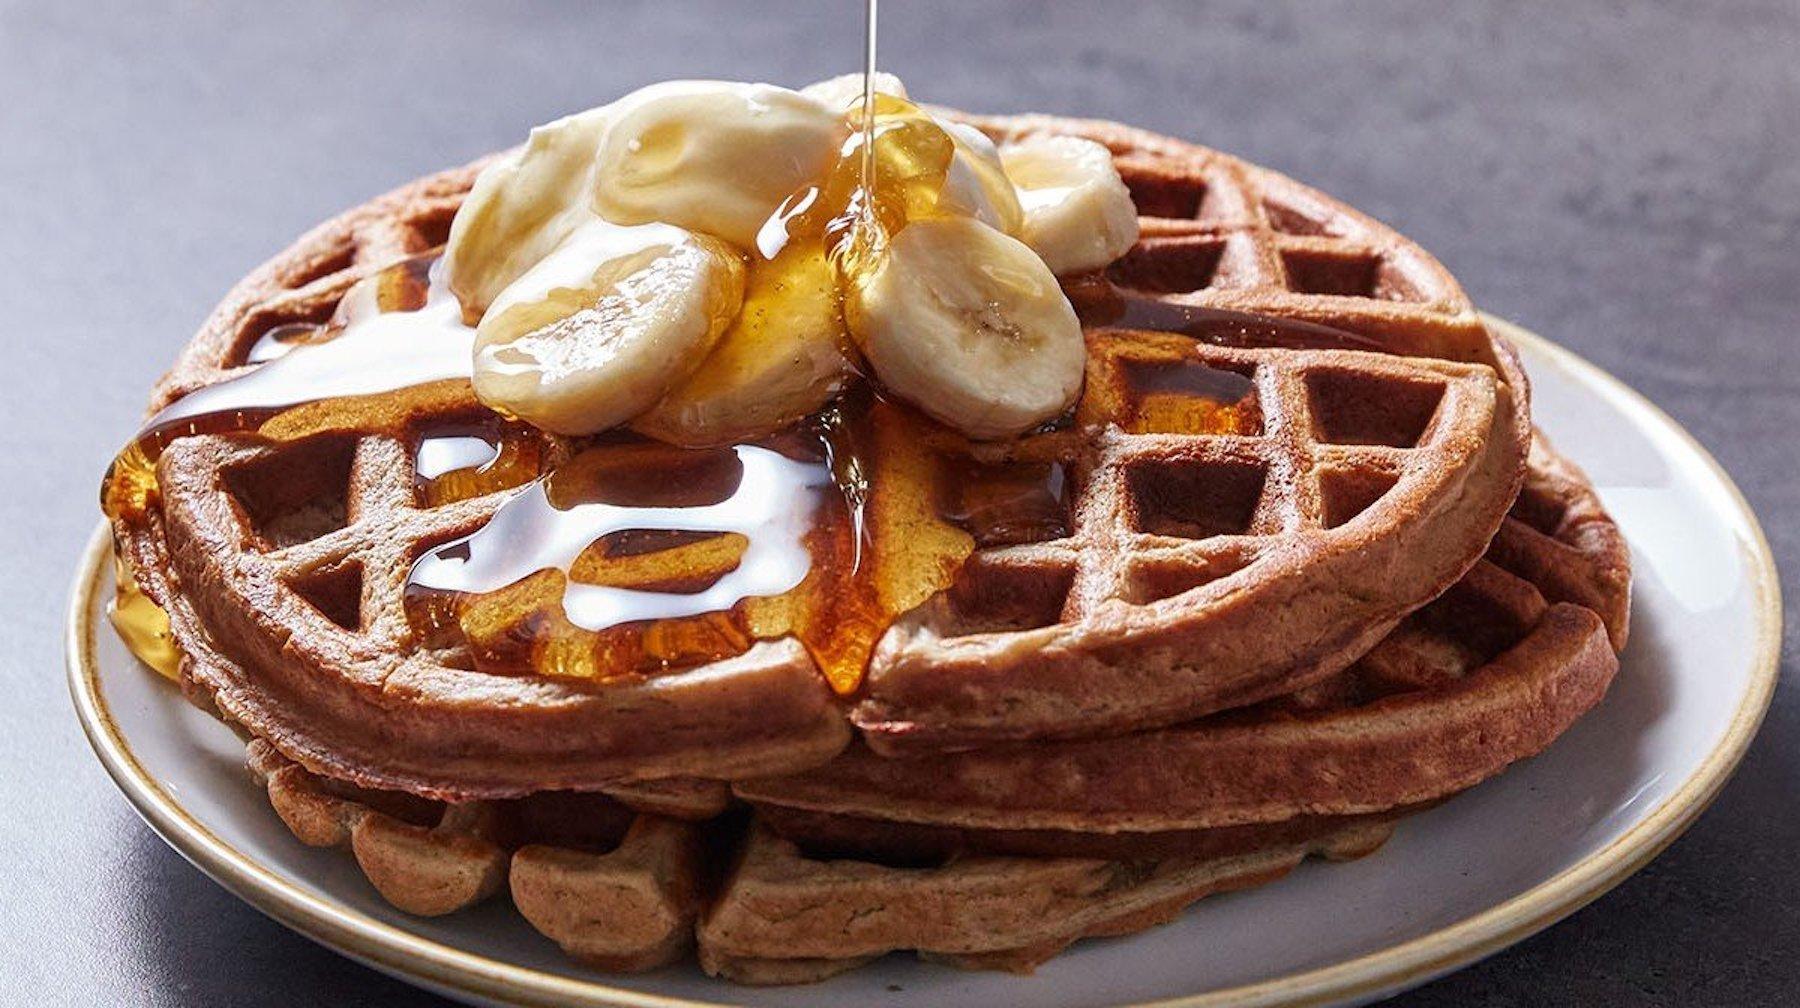 Marino Katsouris Proteinvåfflor | Ett läckert frukostrecept